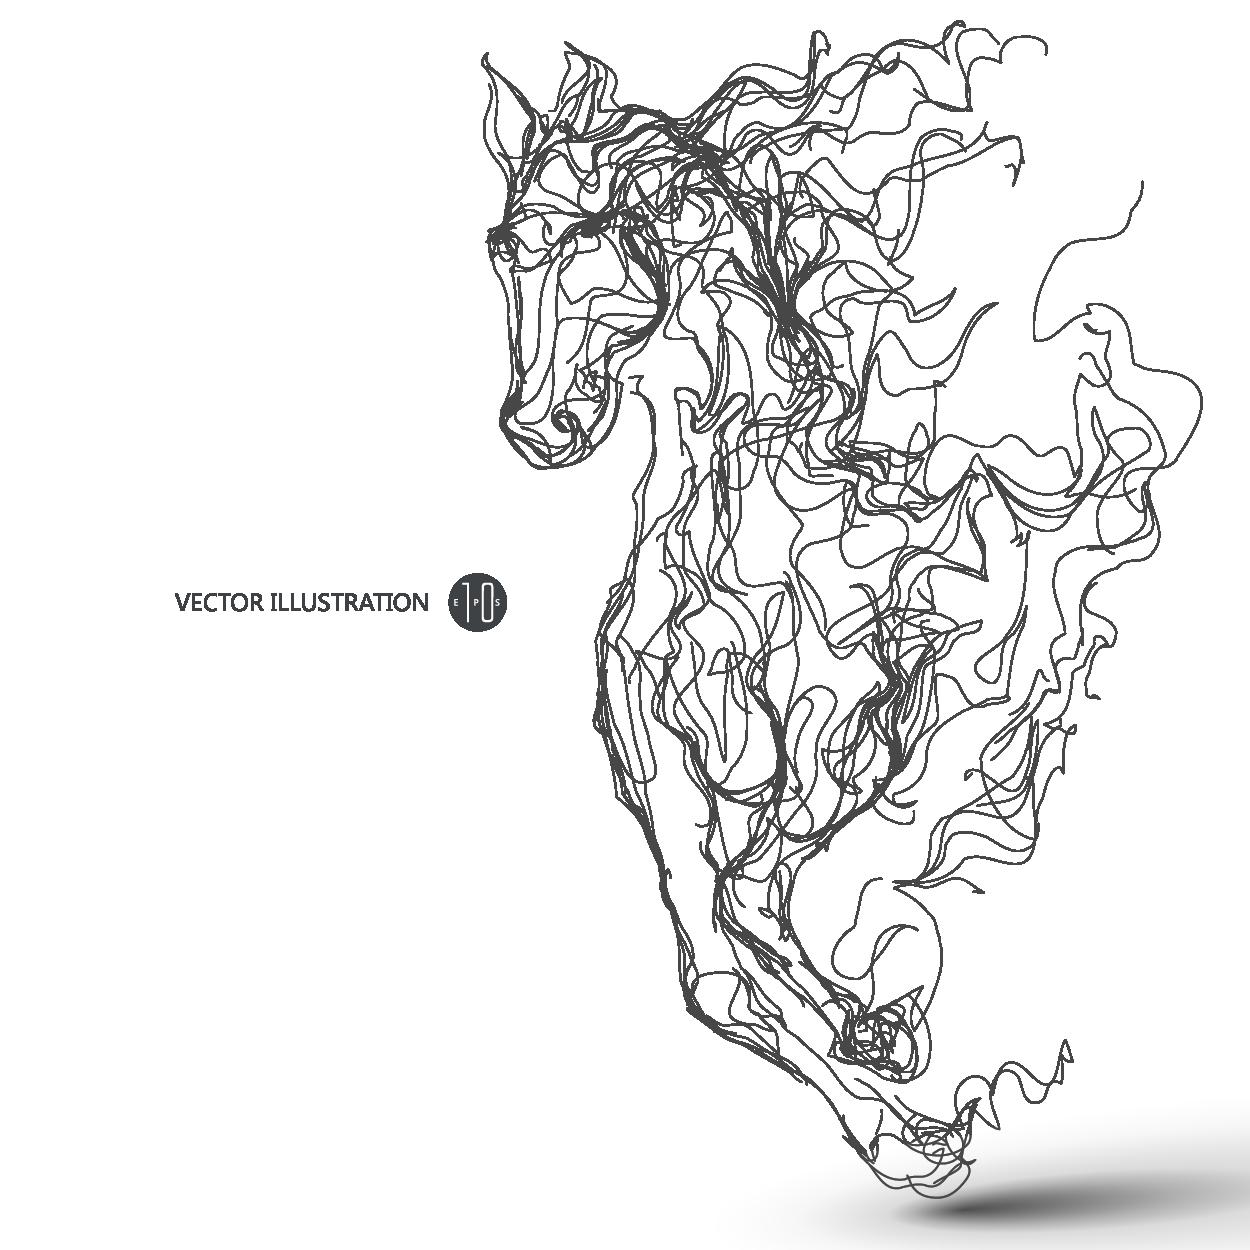 Placement Pattern Vector Files Animal Horse Animal Horse Vector Files Placement Pattern Womenswear Design Line Drawing Running Illustration Vector Illustration